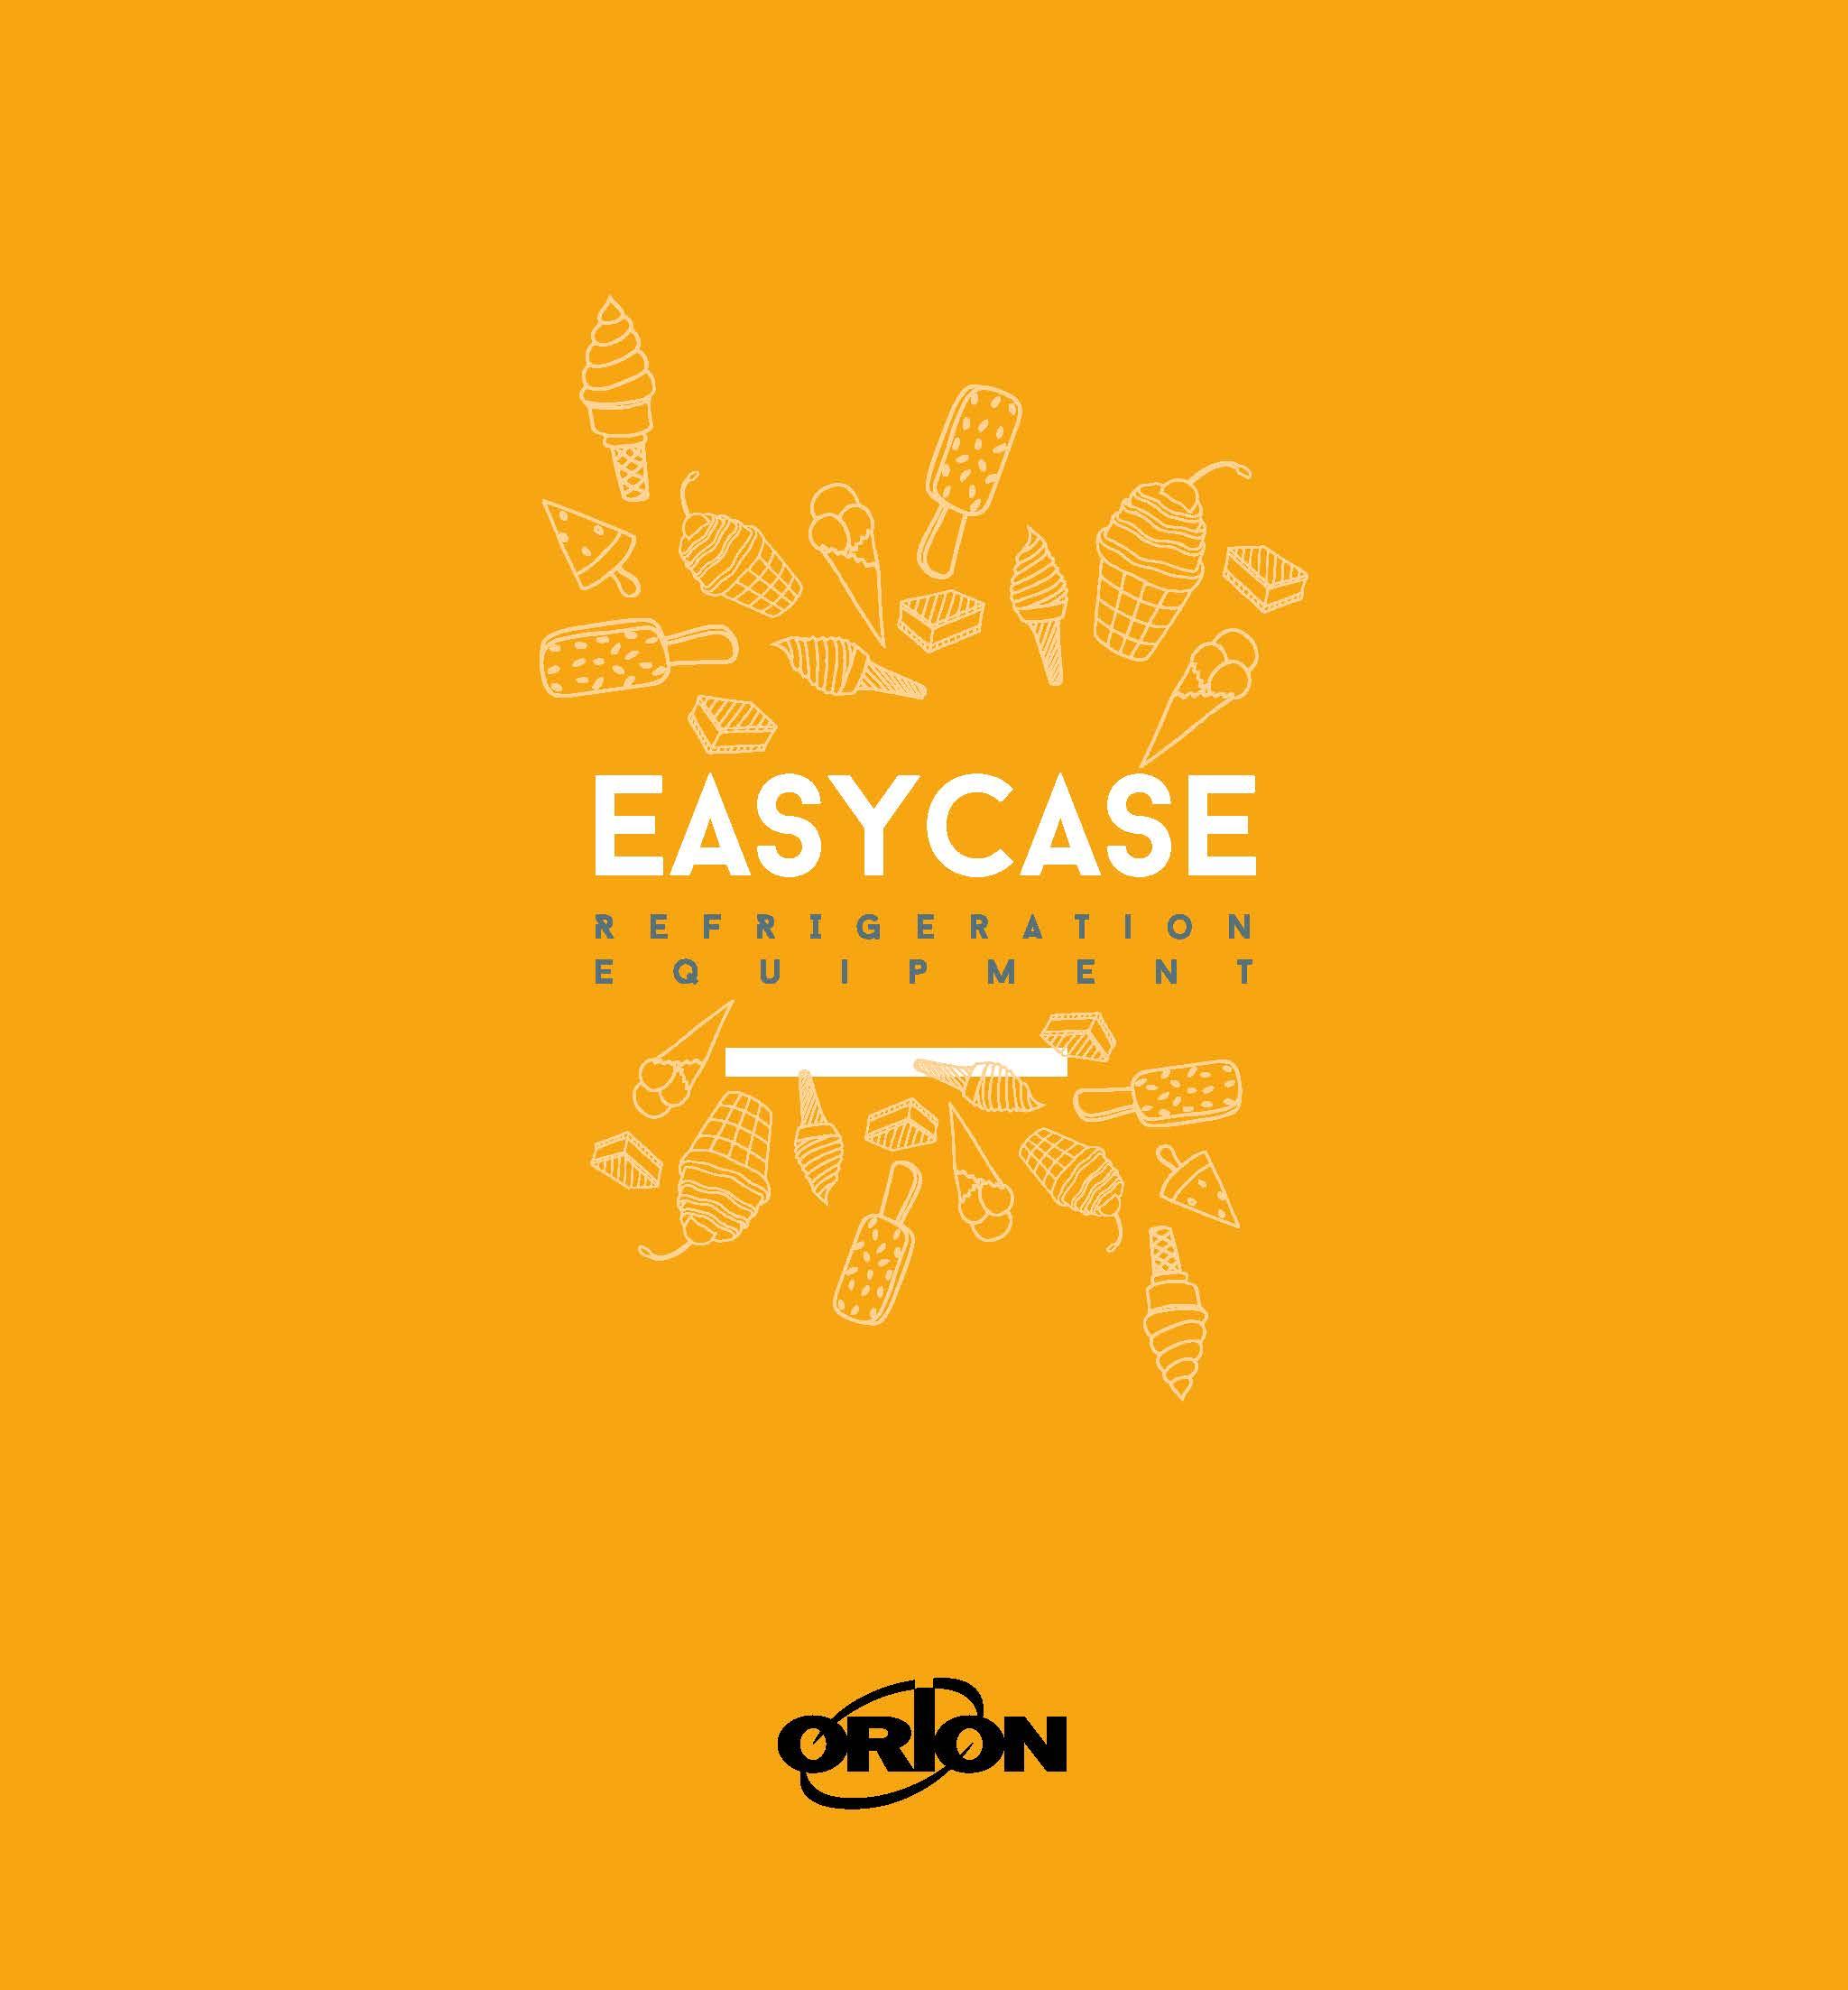 Orion – Easy Best